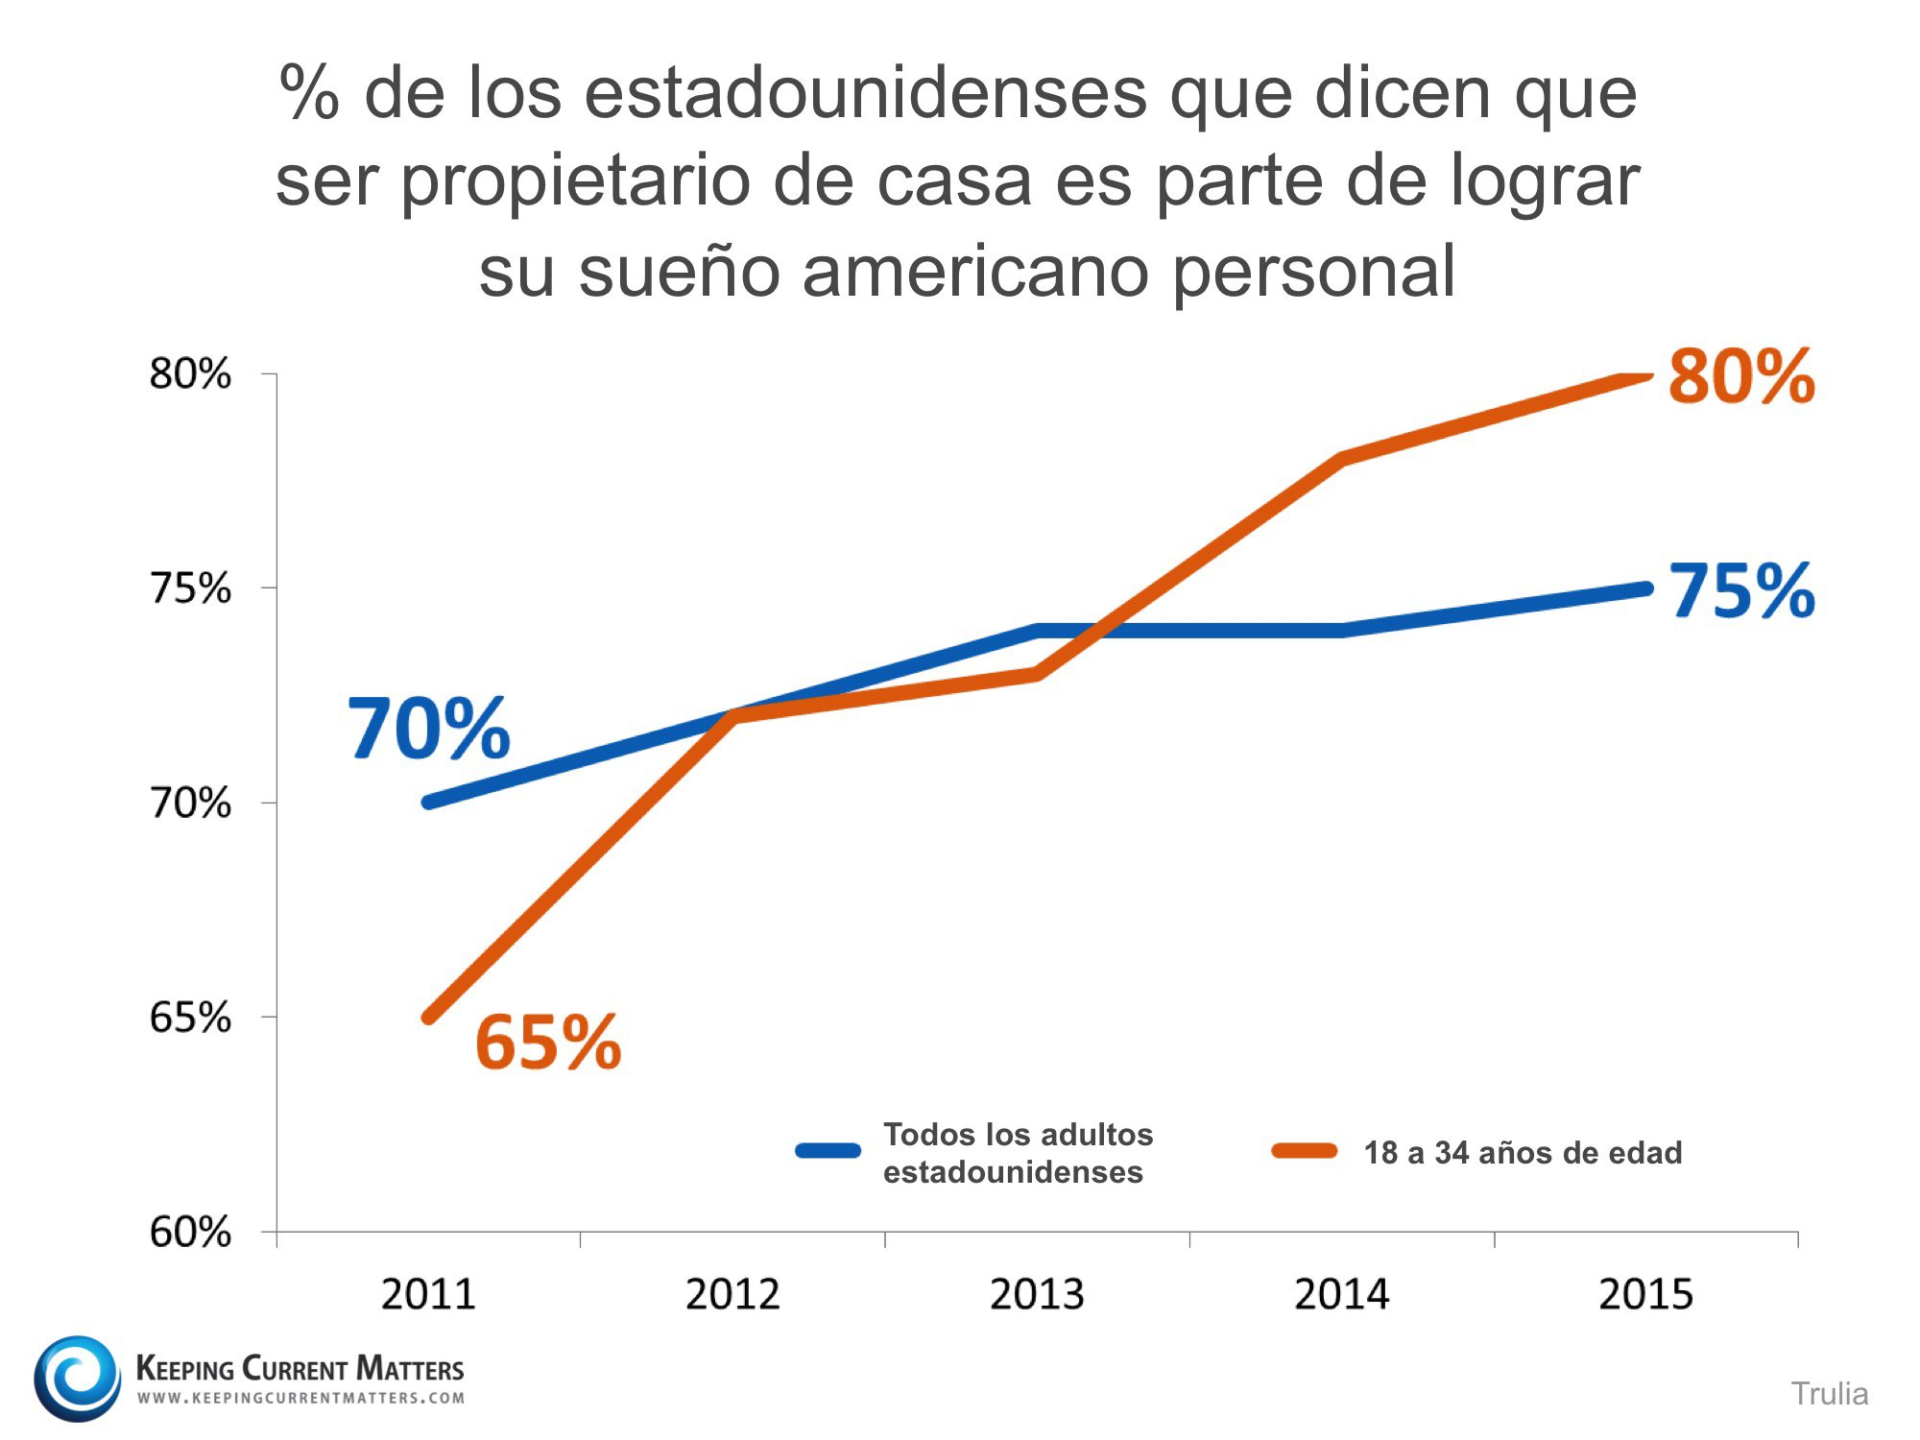 porcentaje propietarios que dicen q ser propietarios es parte del sueno americano | Keeping Current Matters